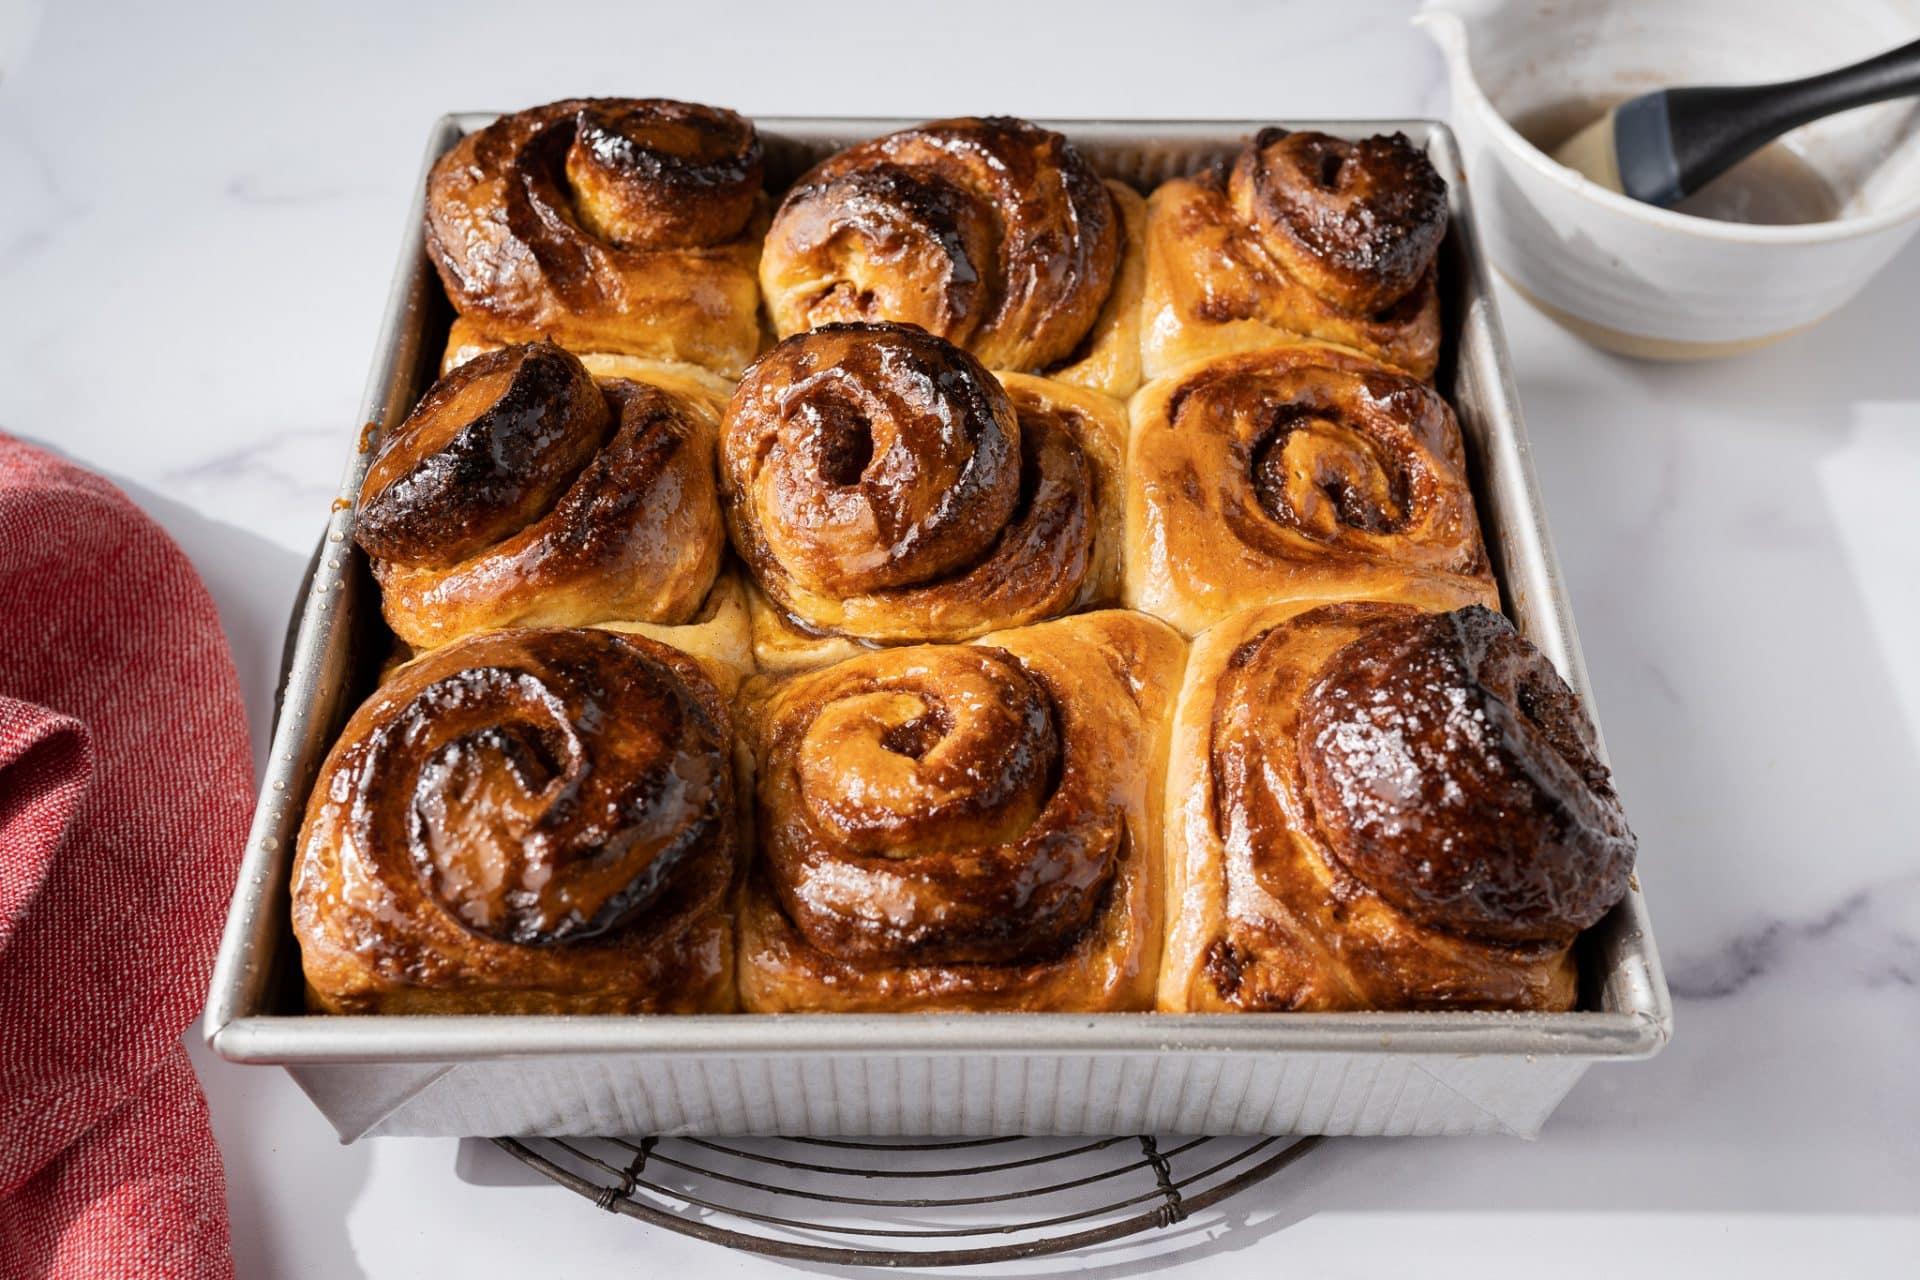 Cardamom rolls glazed with simple syrup